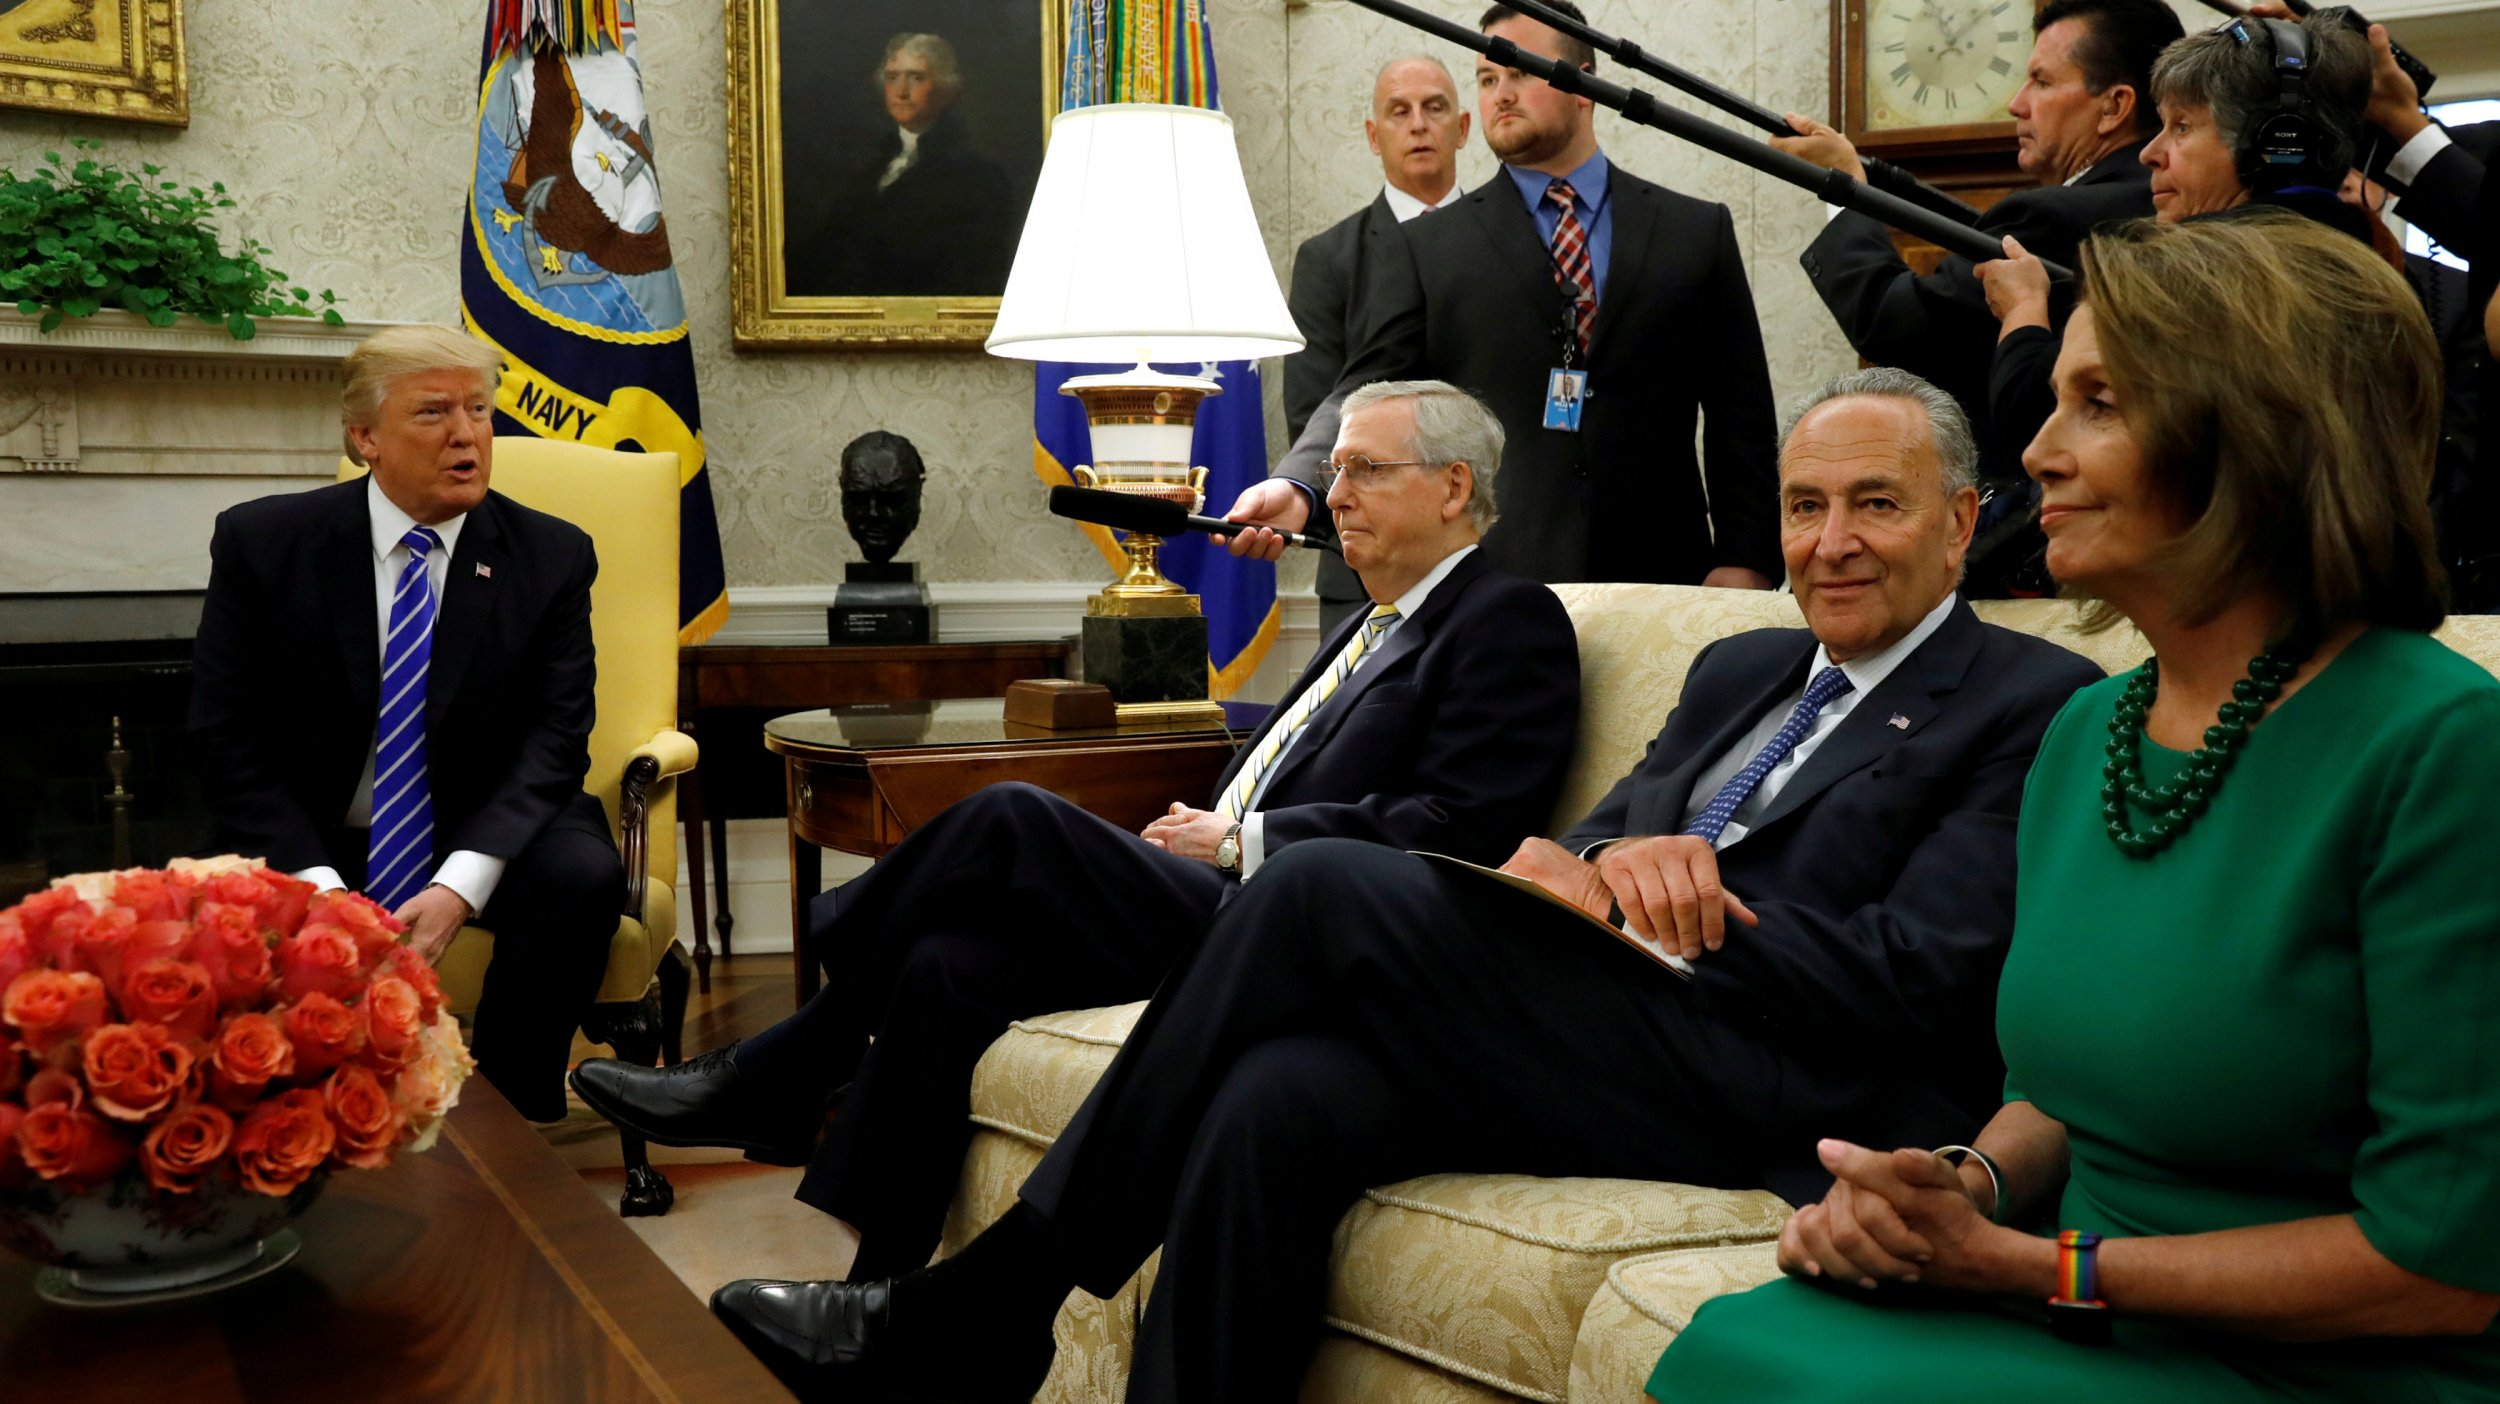 Donald Trump, Nancy Pelosi, Mitch McConnell, Chuck Schumer